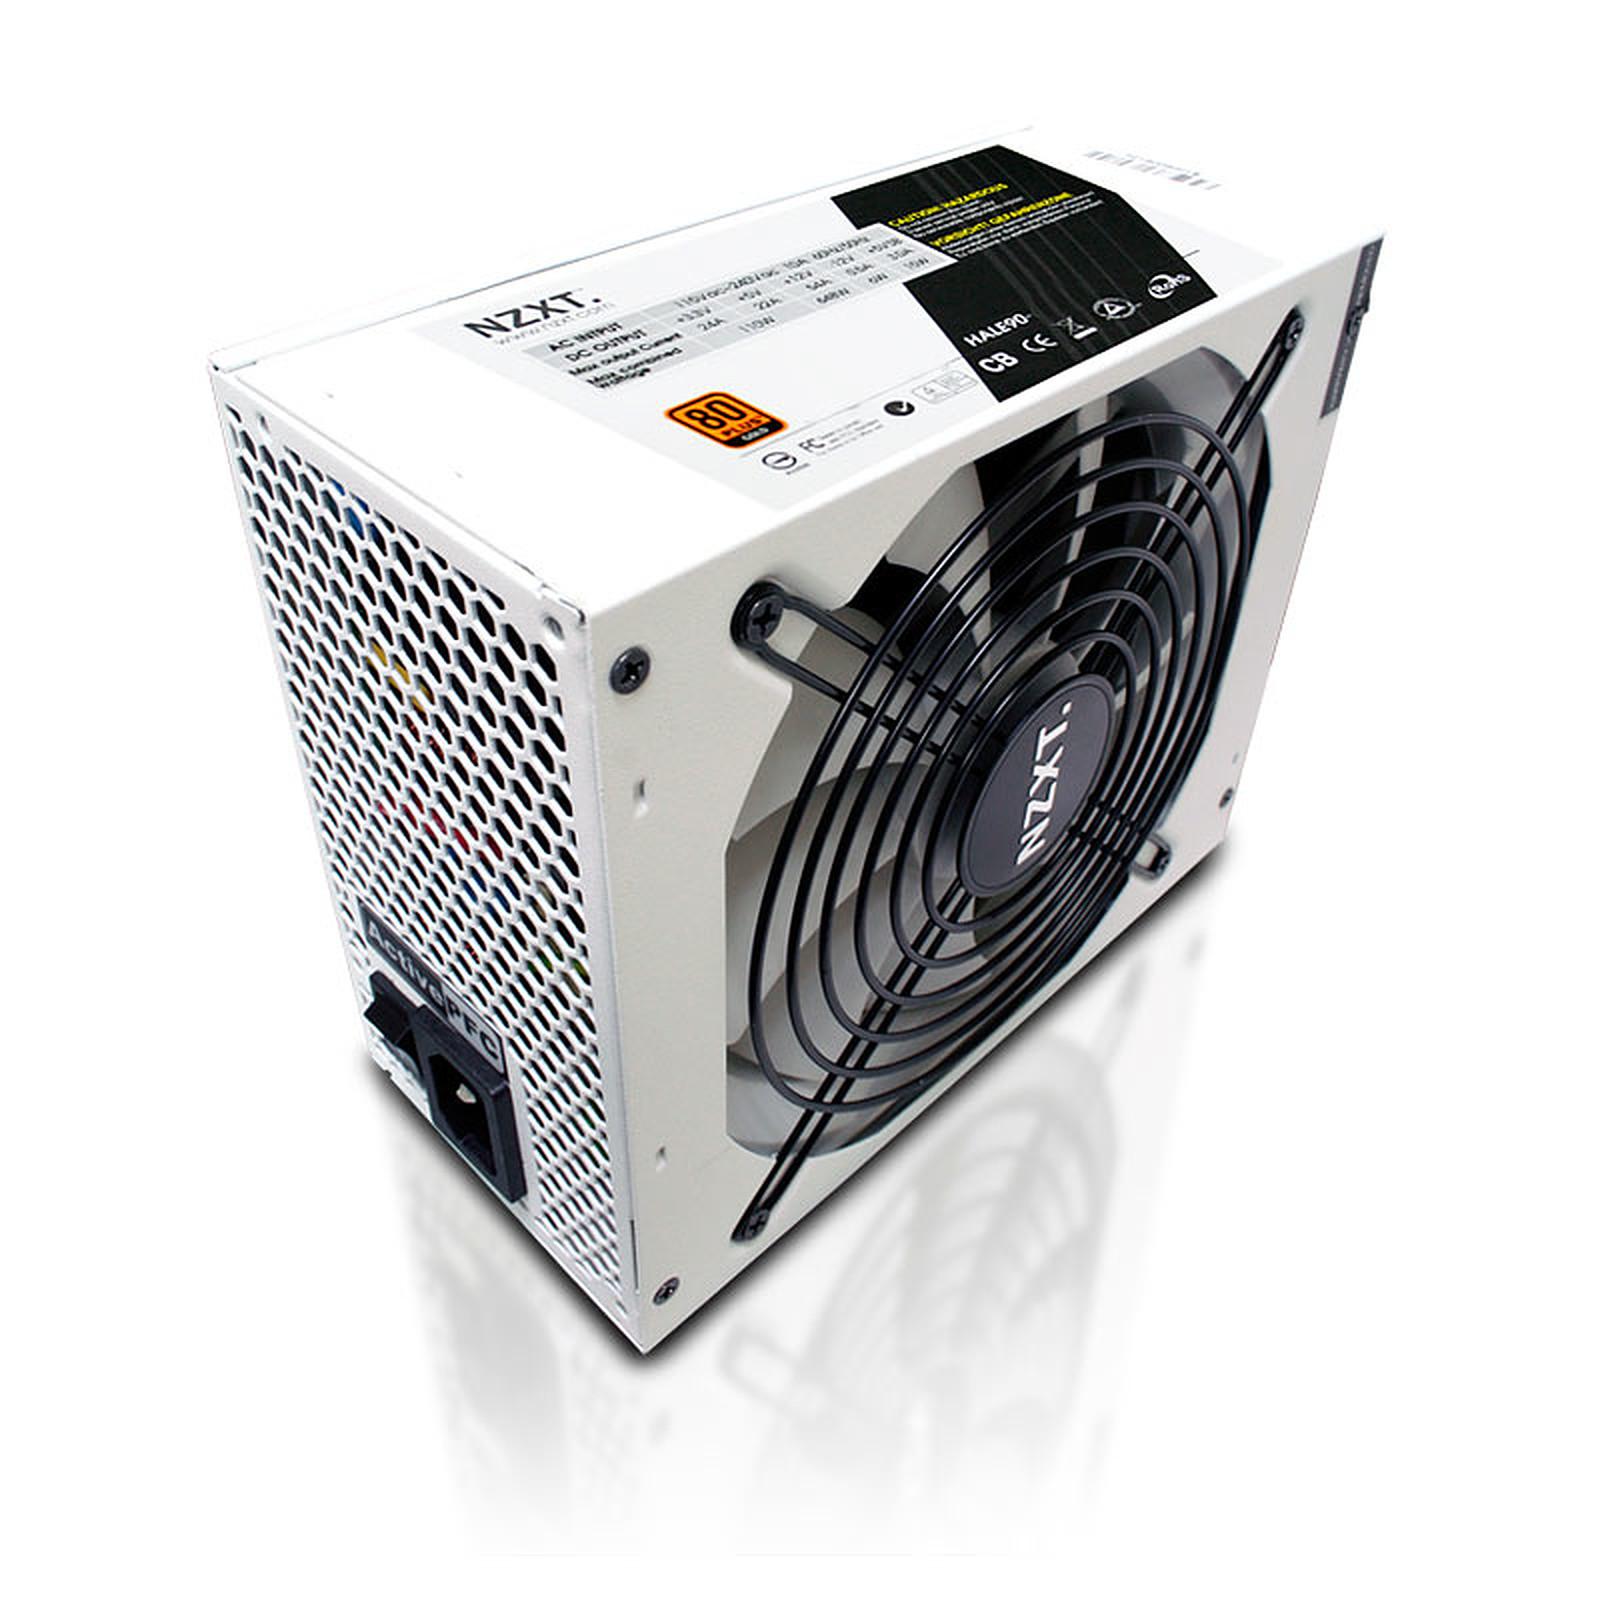 NZXT HALE 90 Power 750W 80PLUS Gold